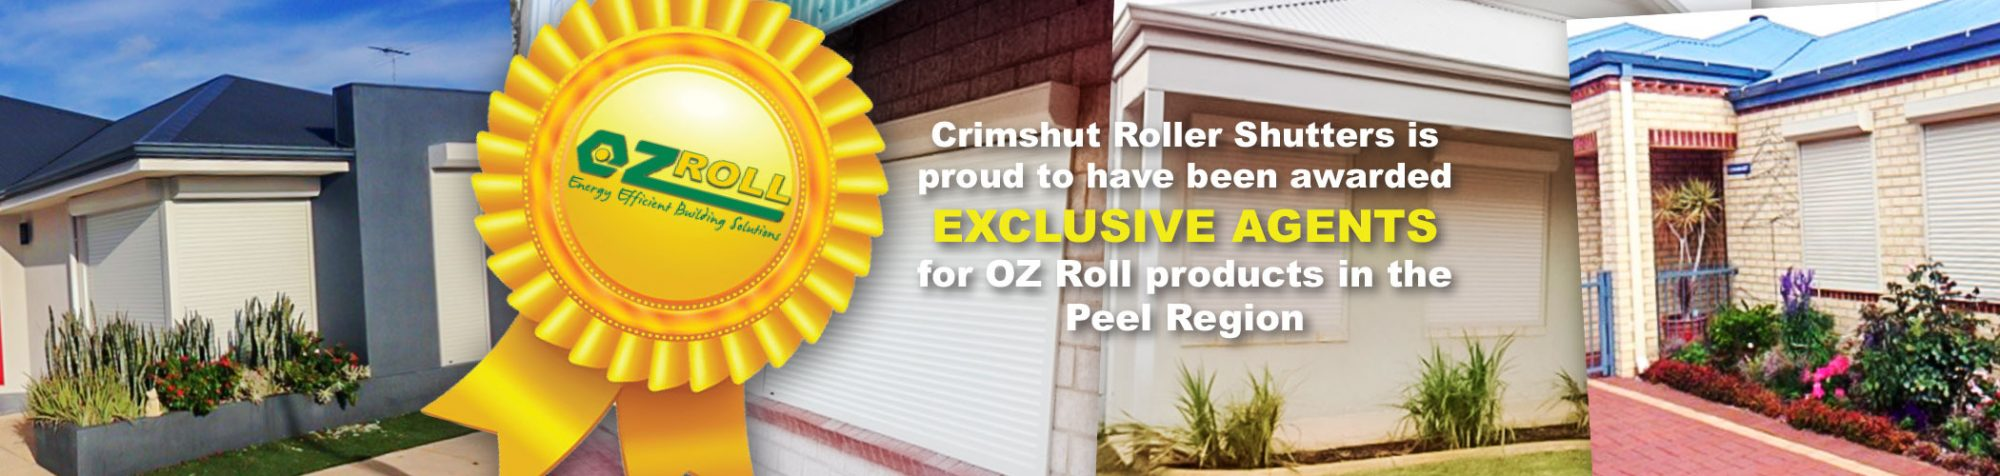 Ozroll Roller Shutters